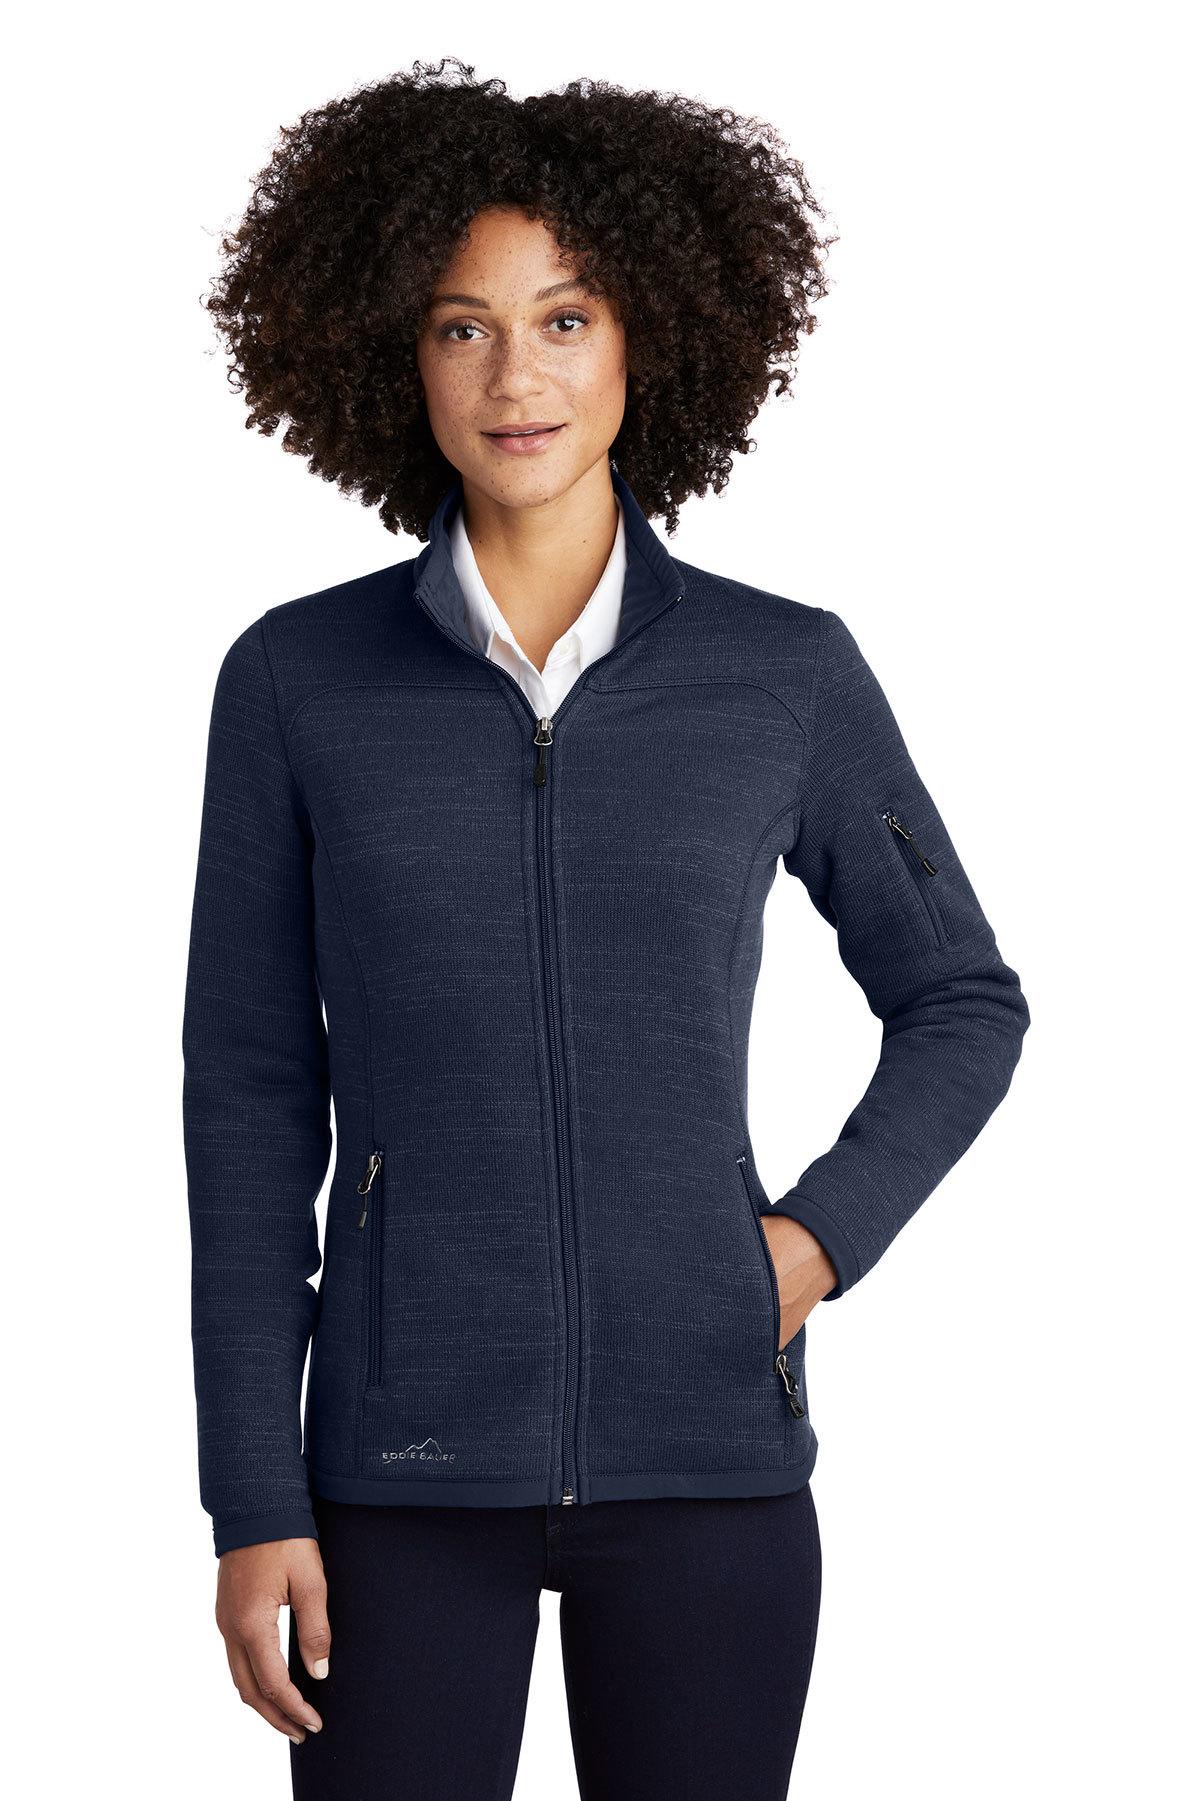 Eddie Bauer EB251 - Ladies Sweater Fleece Full-Zip